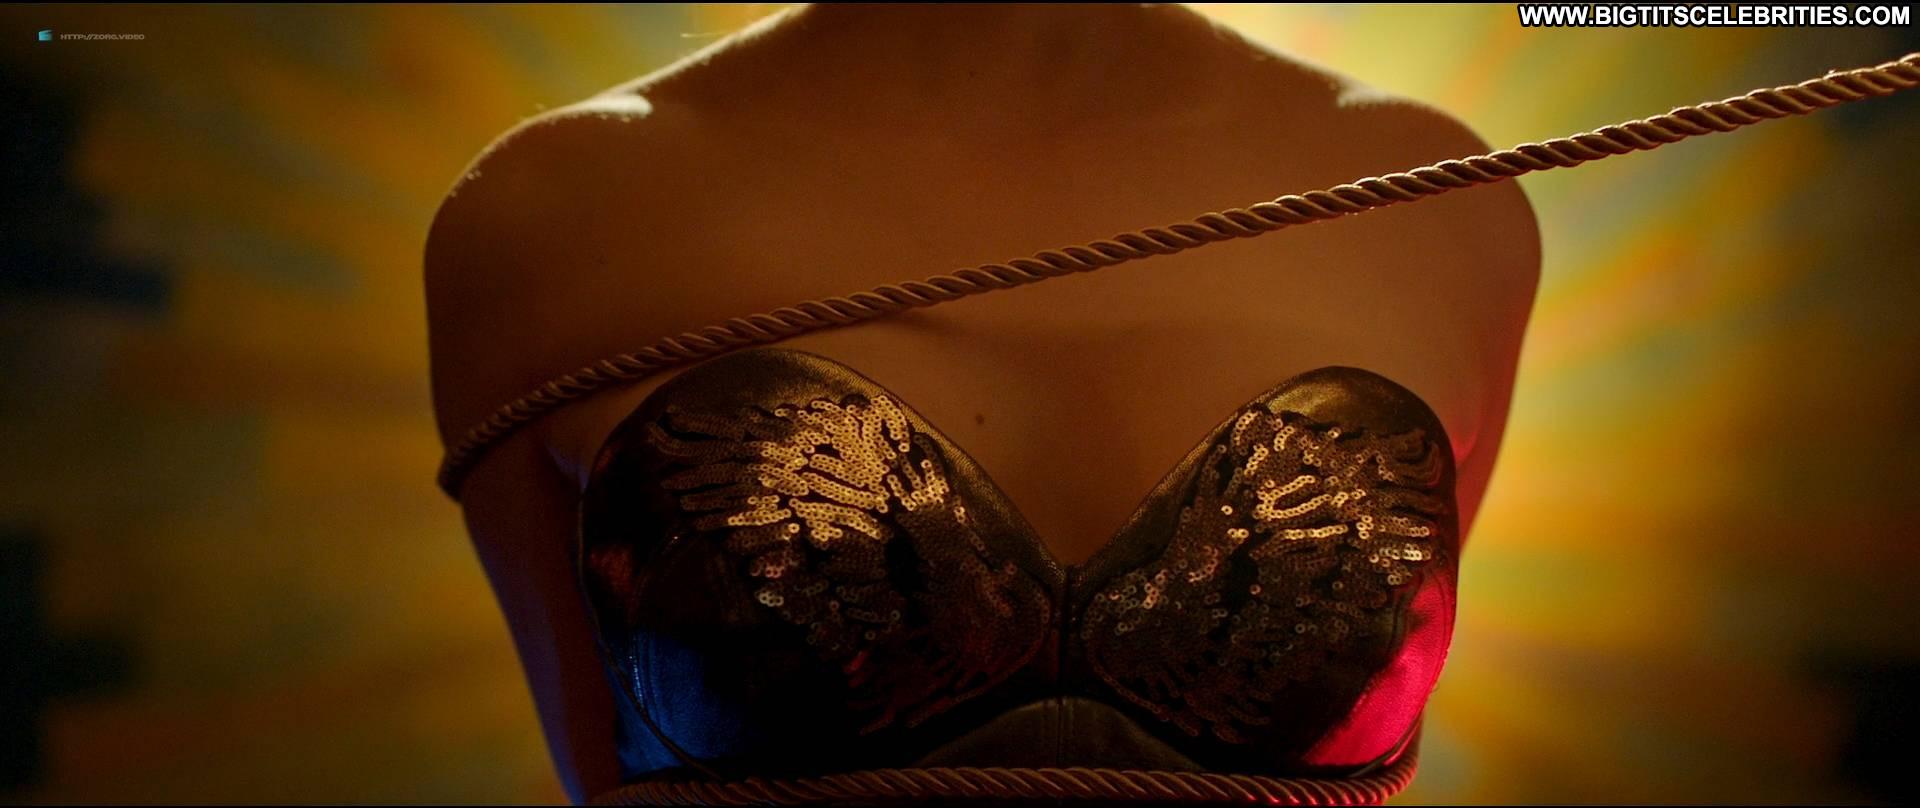 Bella Heathcote Professor Marston And The Wonder Women Celebrity Beautiful Babe Posing Hot ...